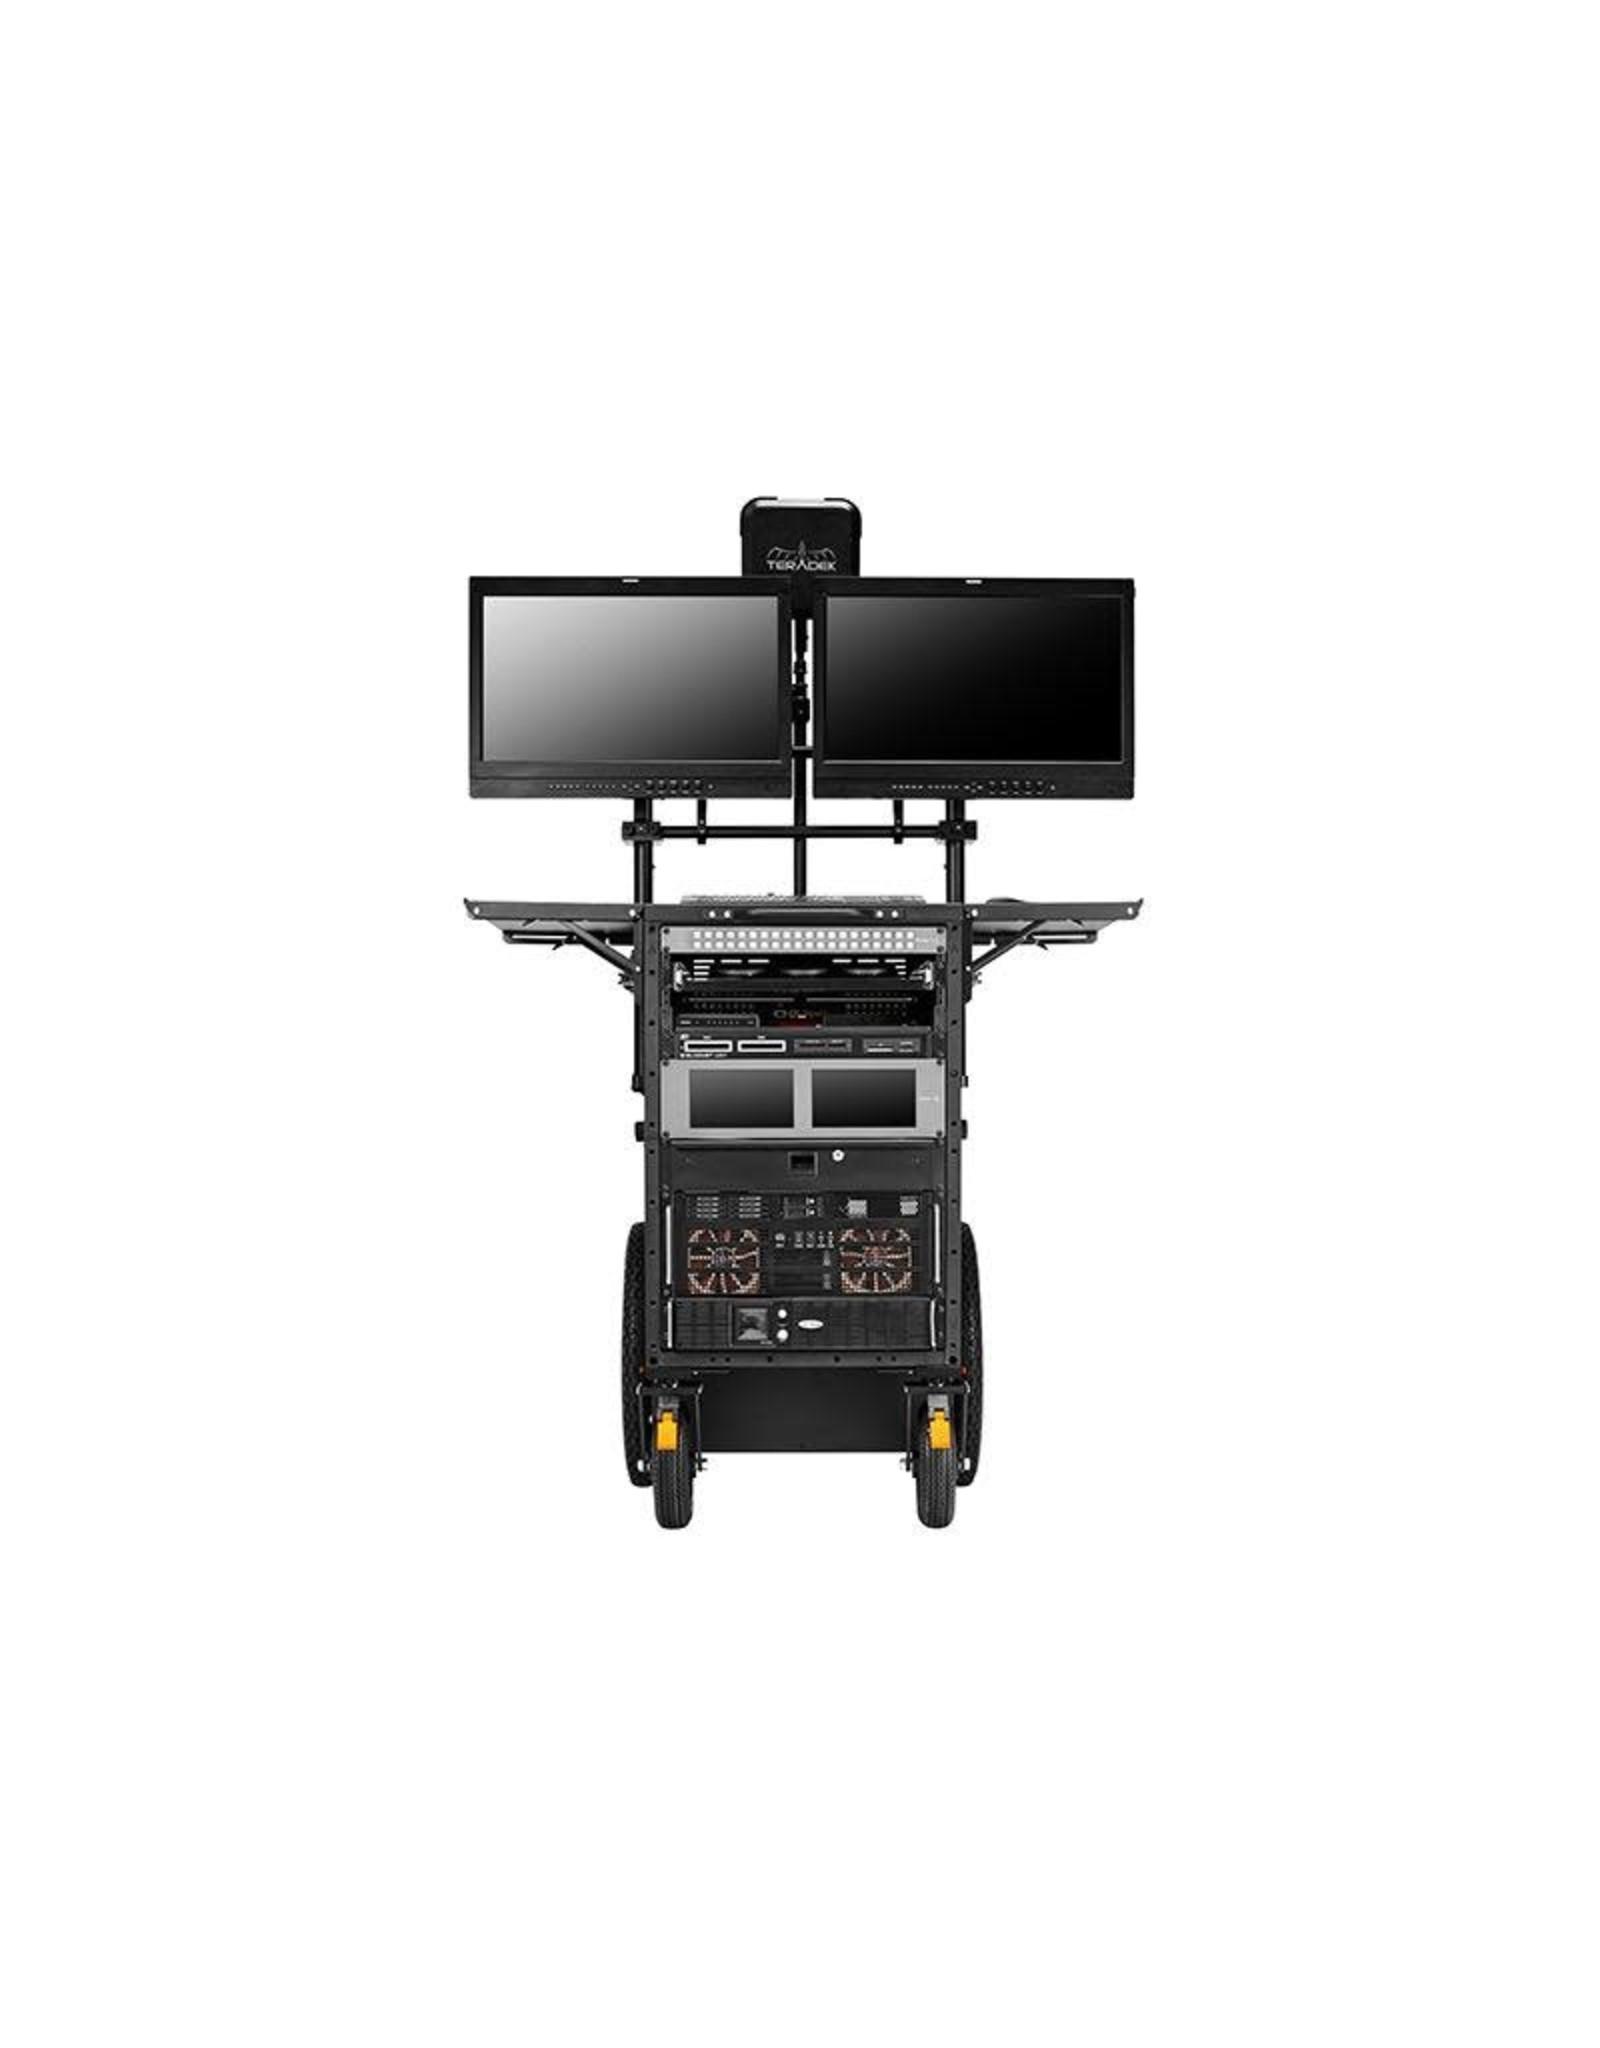 Inovativ Inovativ Deploy Gen IV with Insight Mount and 2 Pro Ultra Monitor Arms